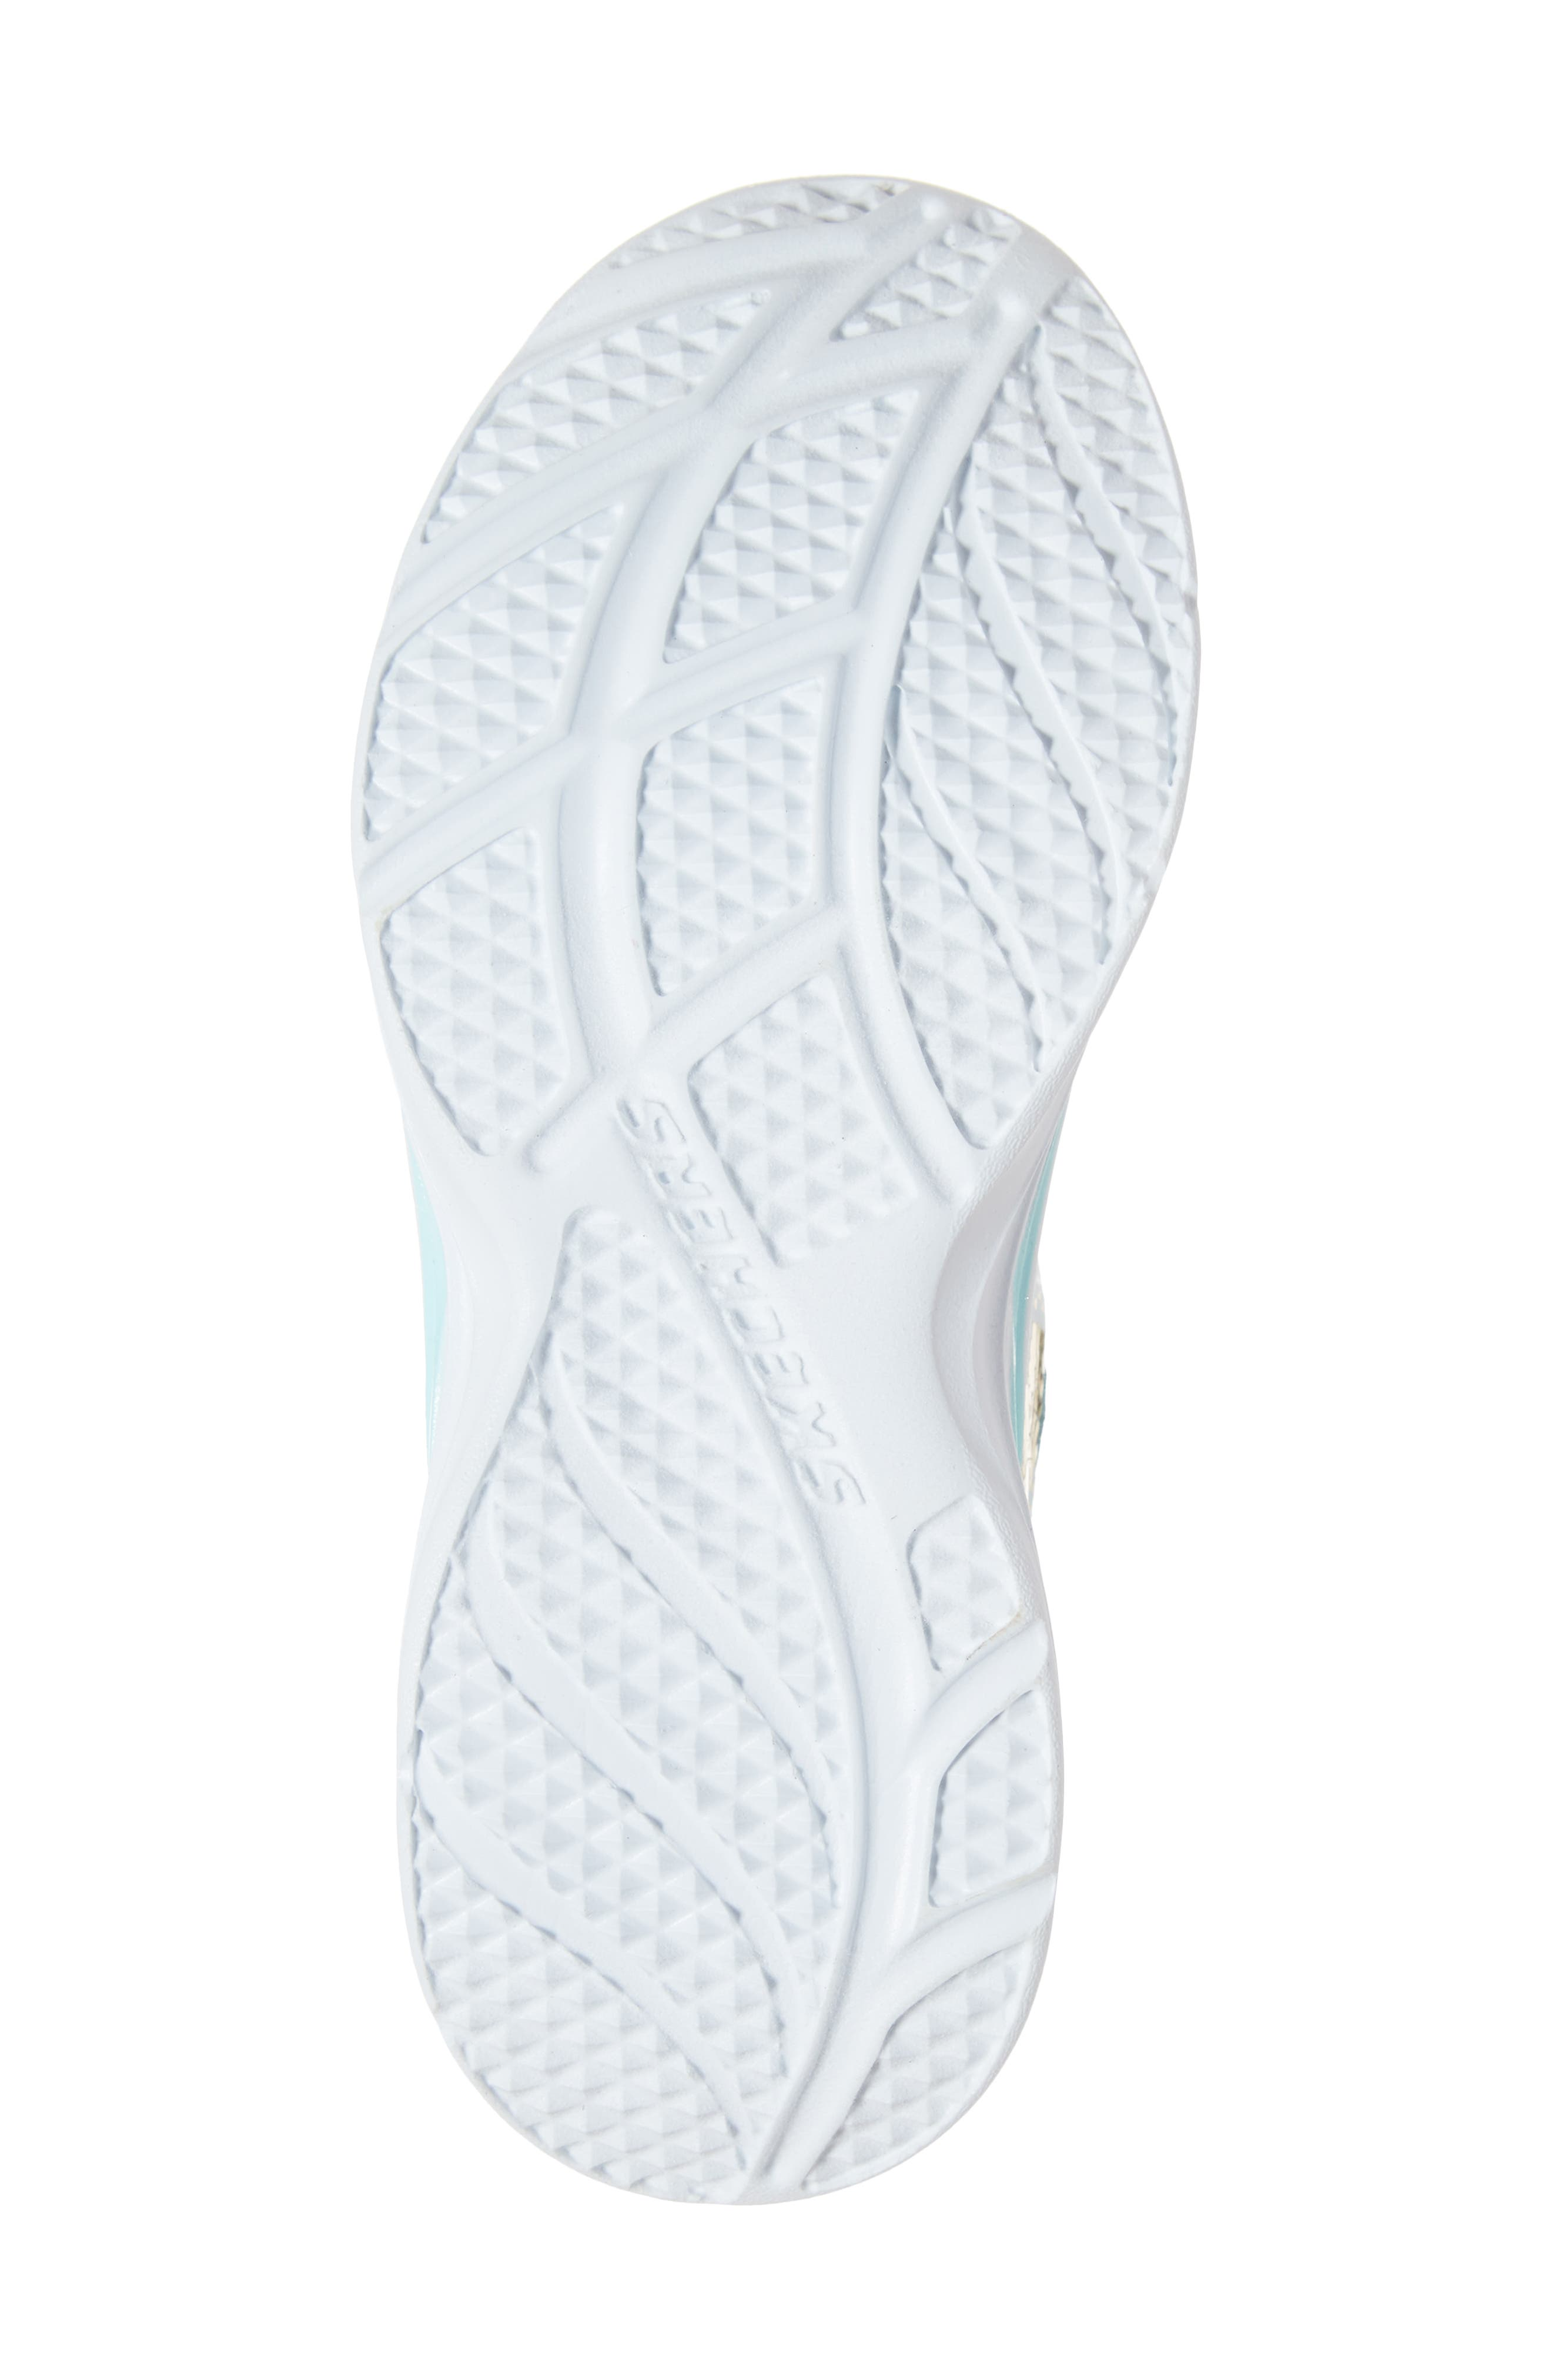 SKECHERS, Double Dreams Shimmer Sneaker, Alternate thumbnail 6, color, AQUA/ PINK TEXTILE